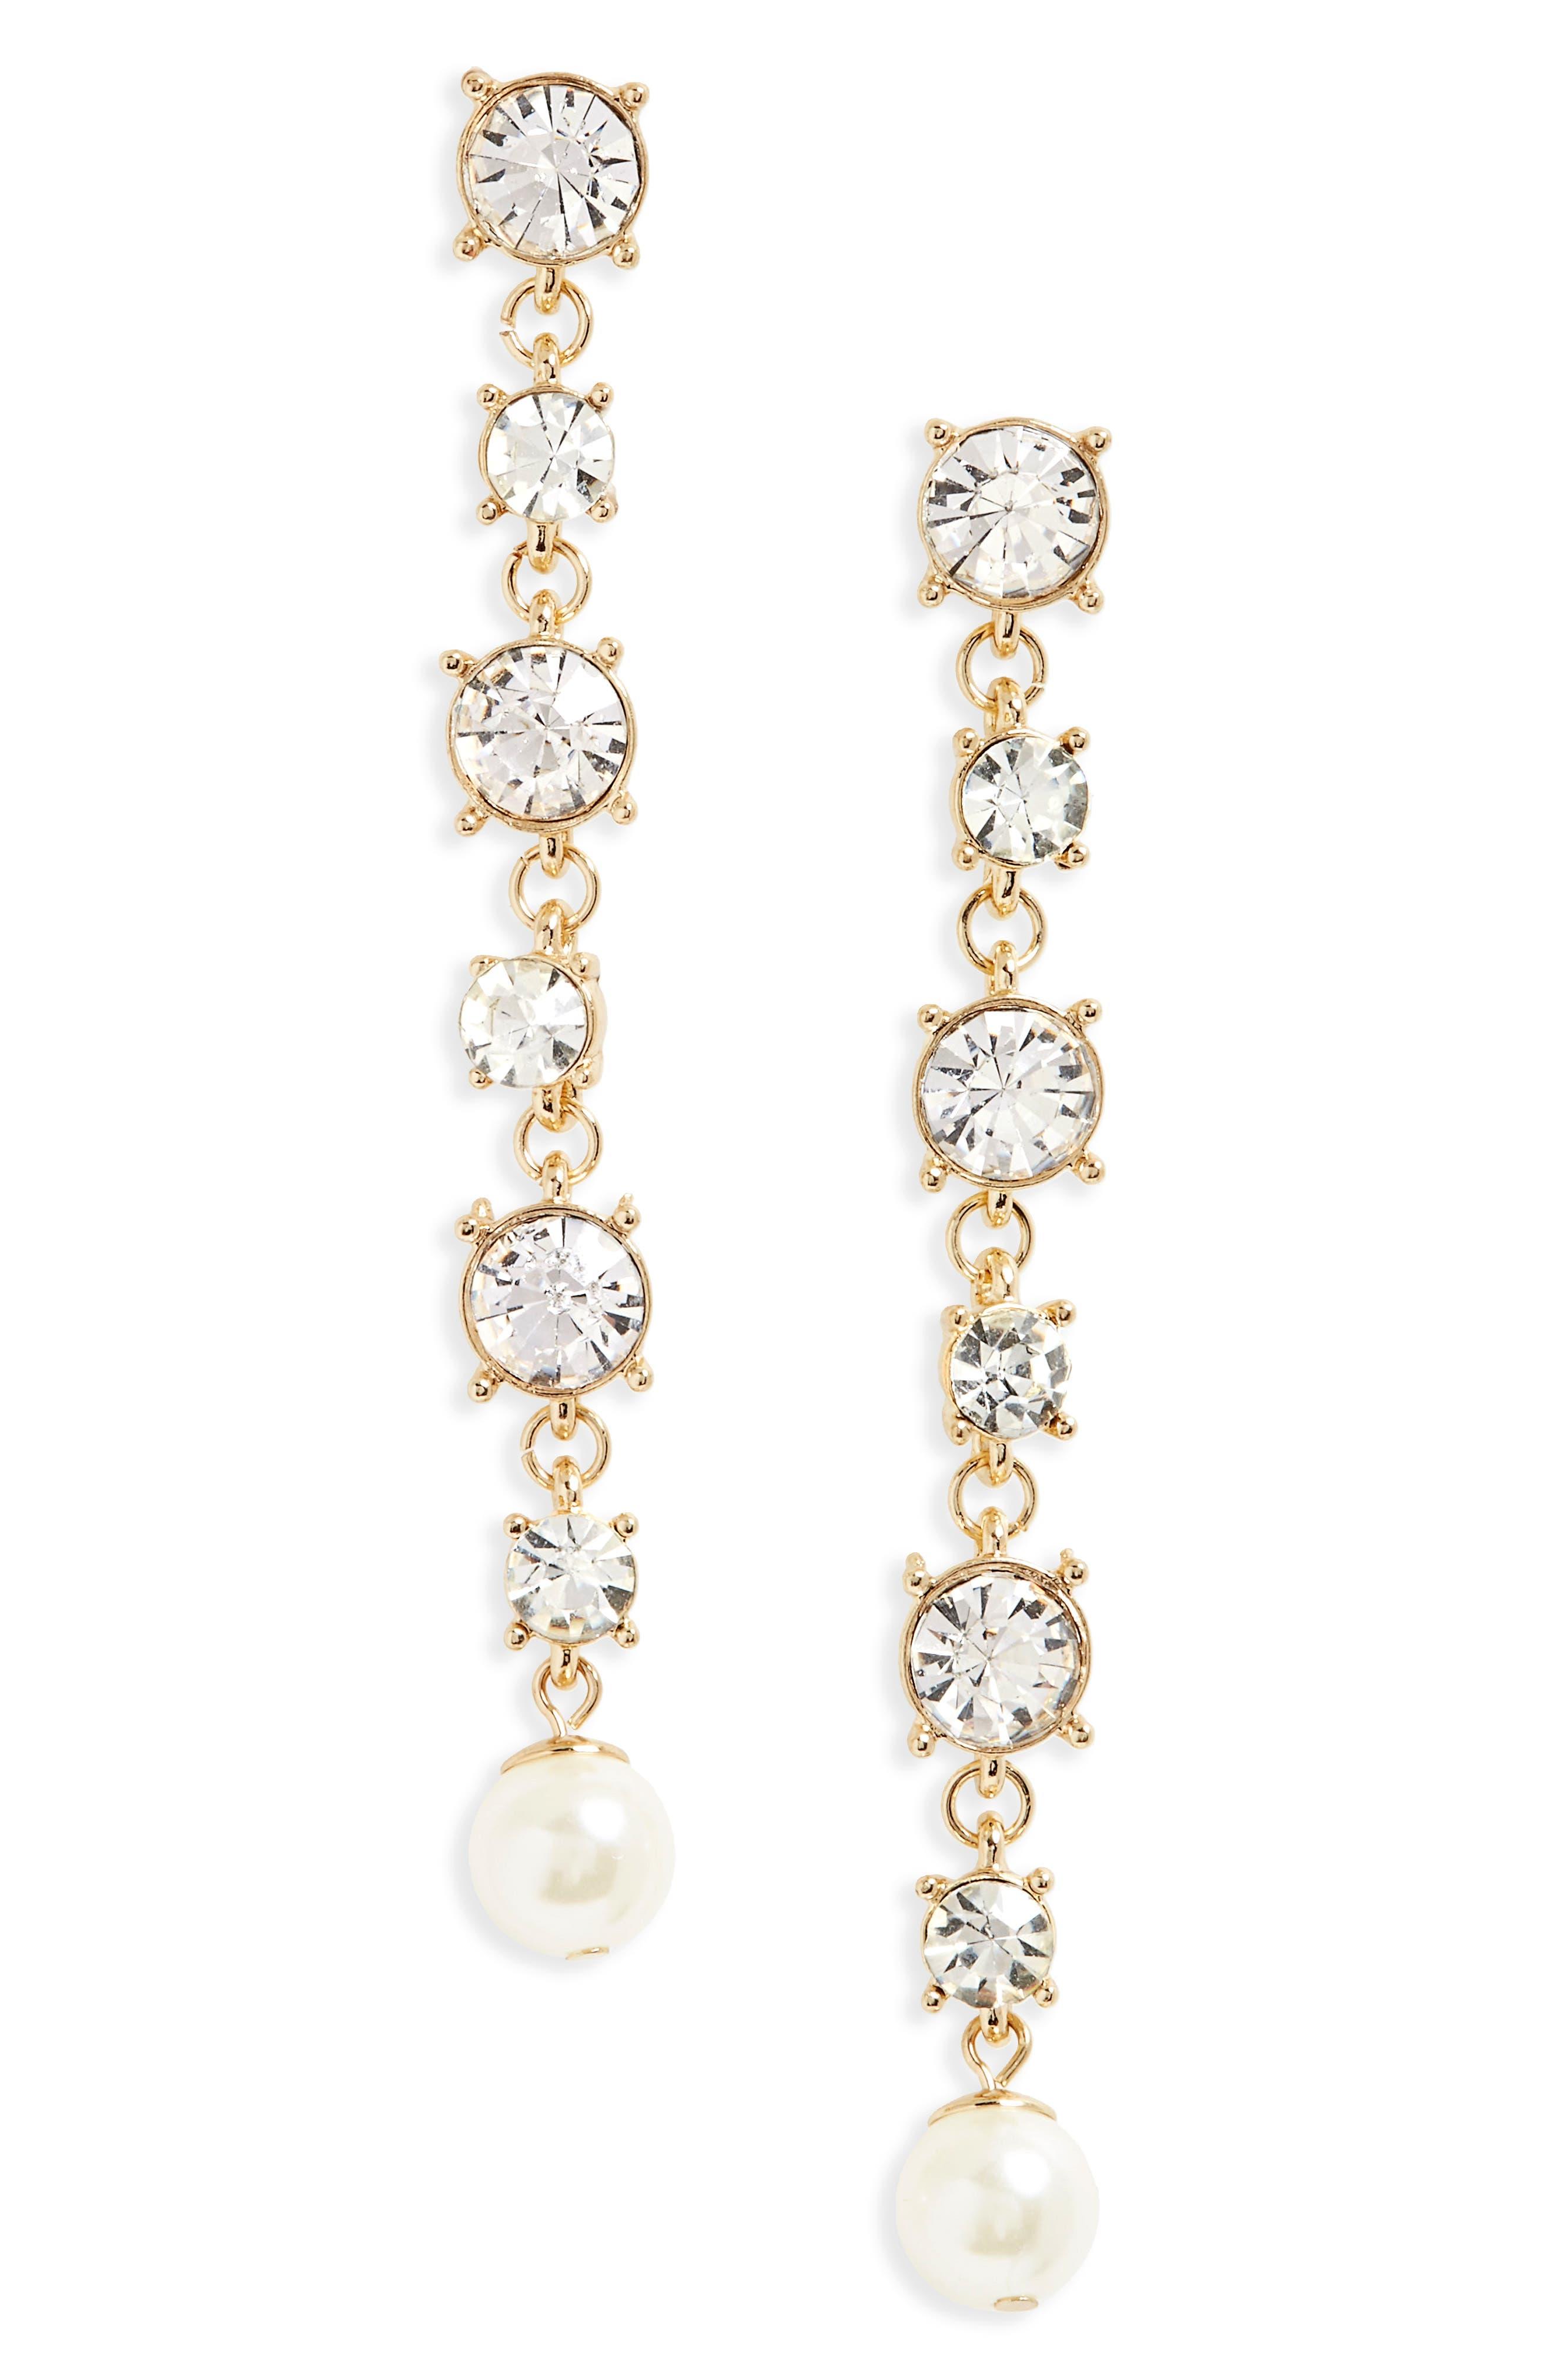 Crystal & Imitation Pearl Drop Earrings,                         Main,                         color, Gold